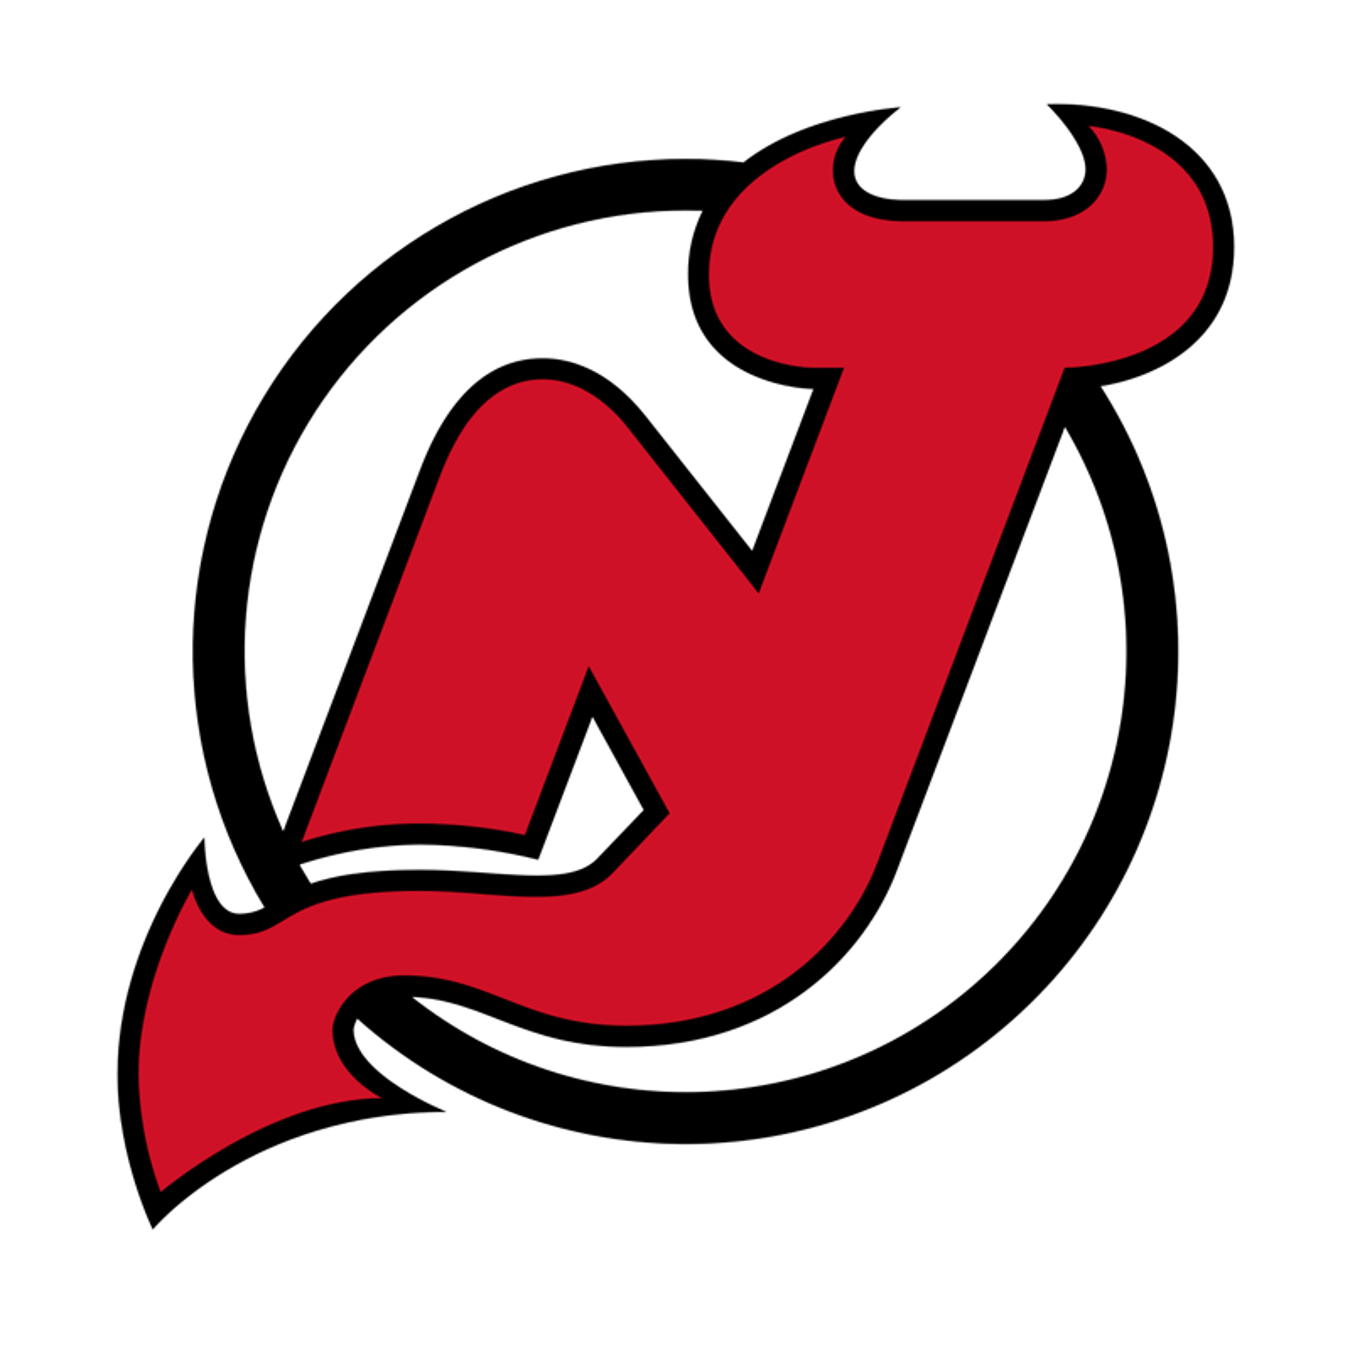 New Jersey Devils team logo